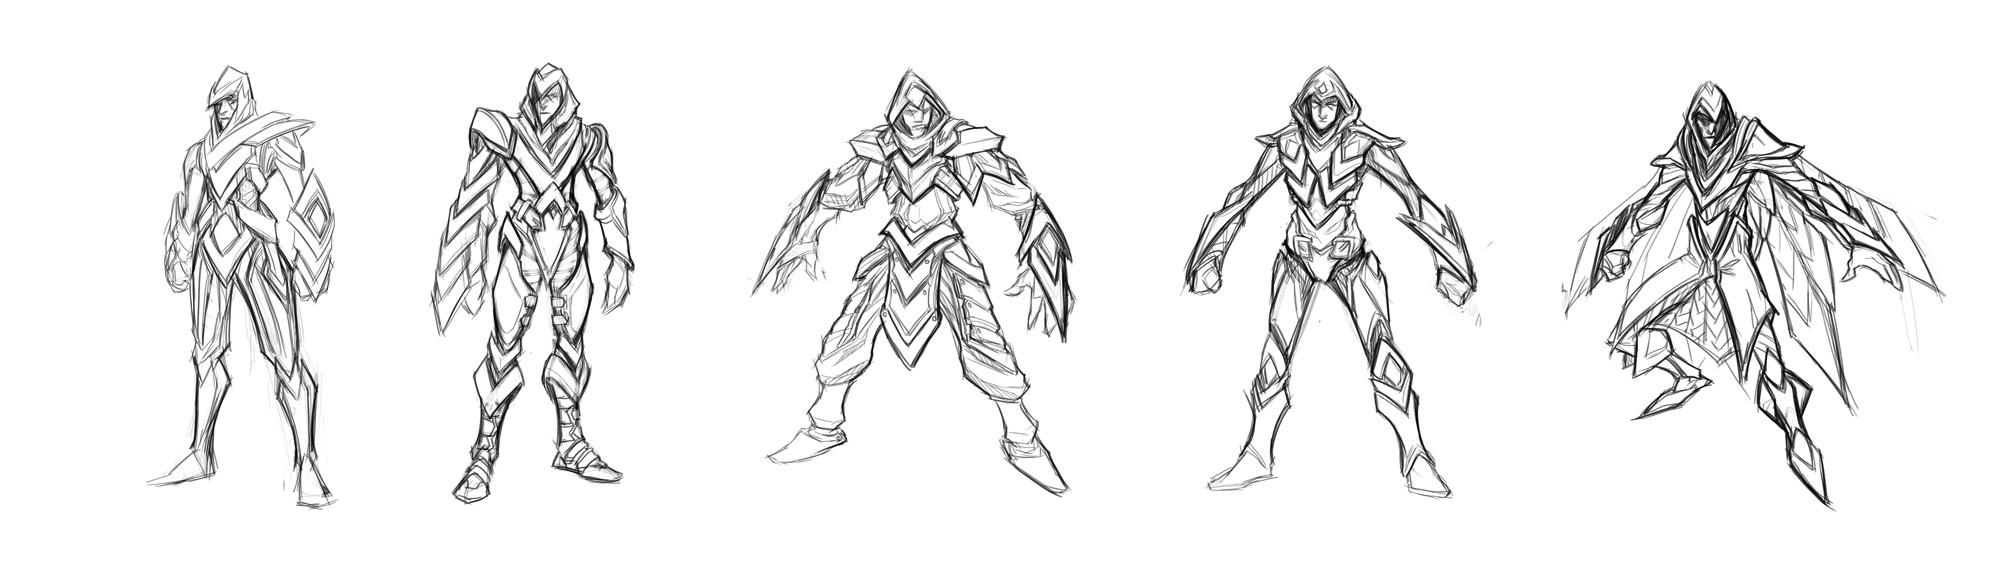 Talon Concept 01.jpg